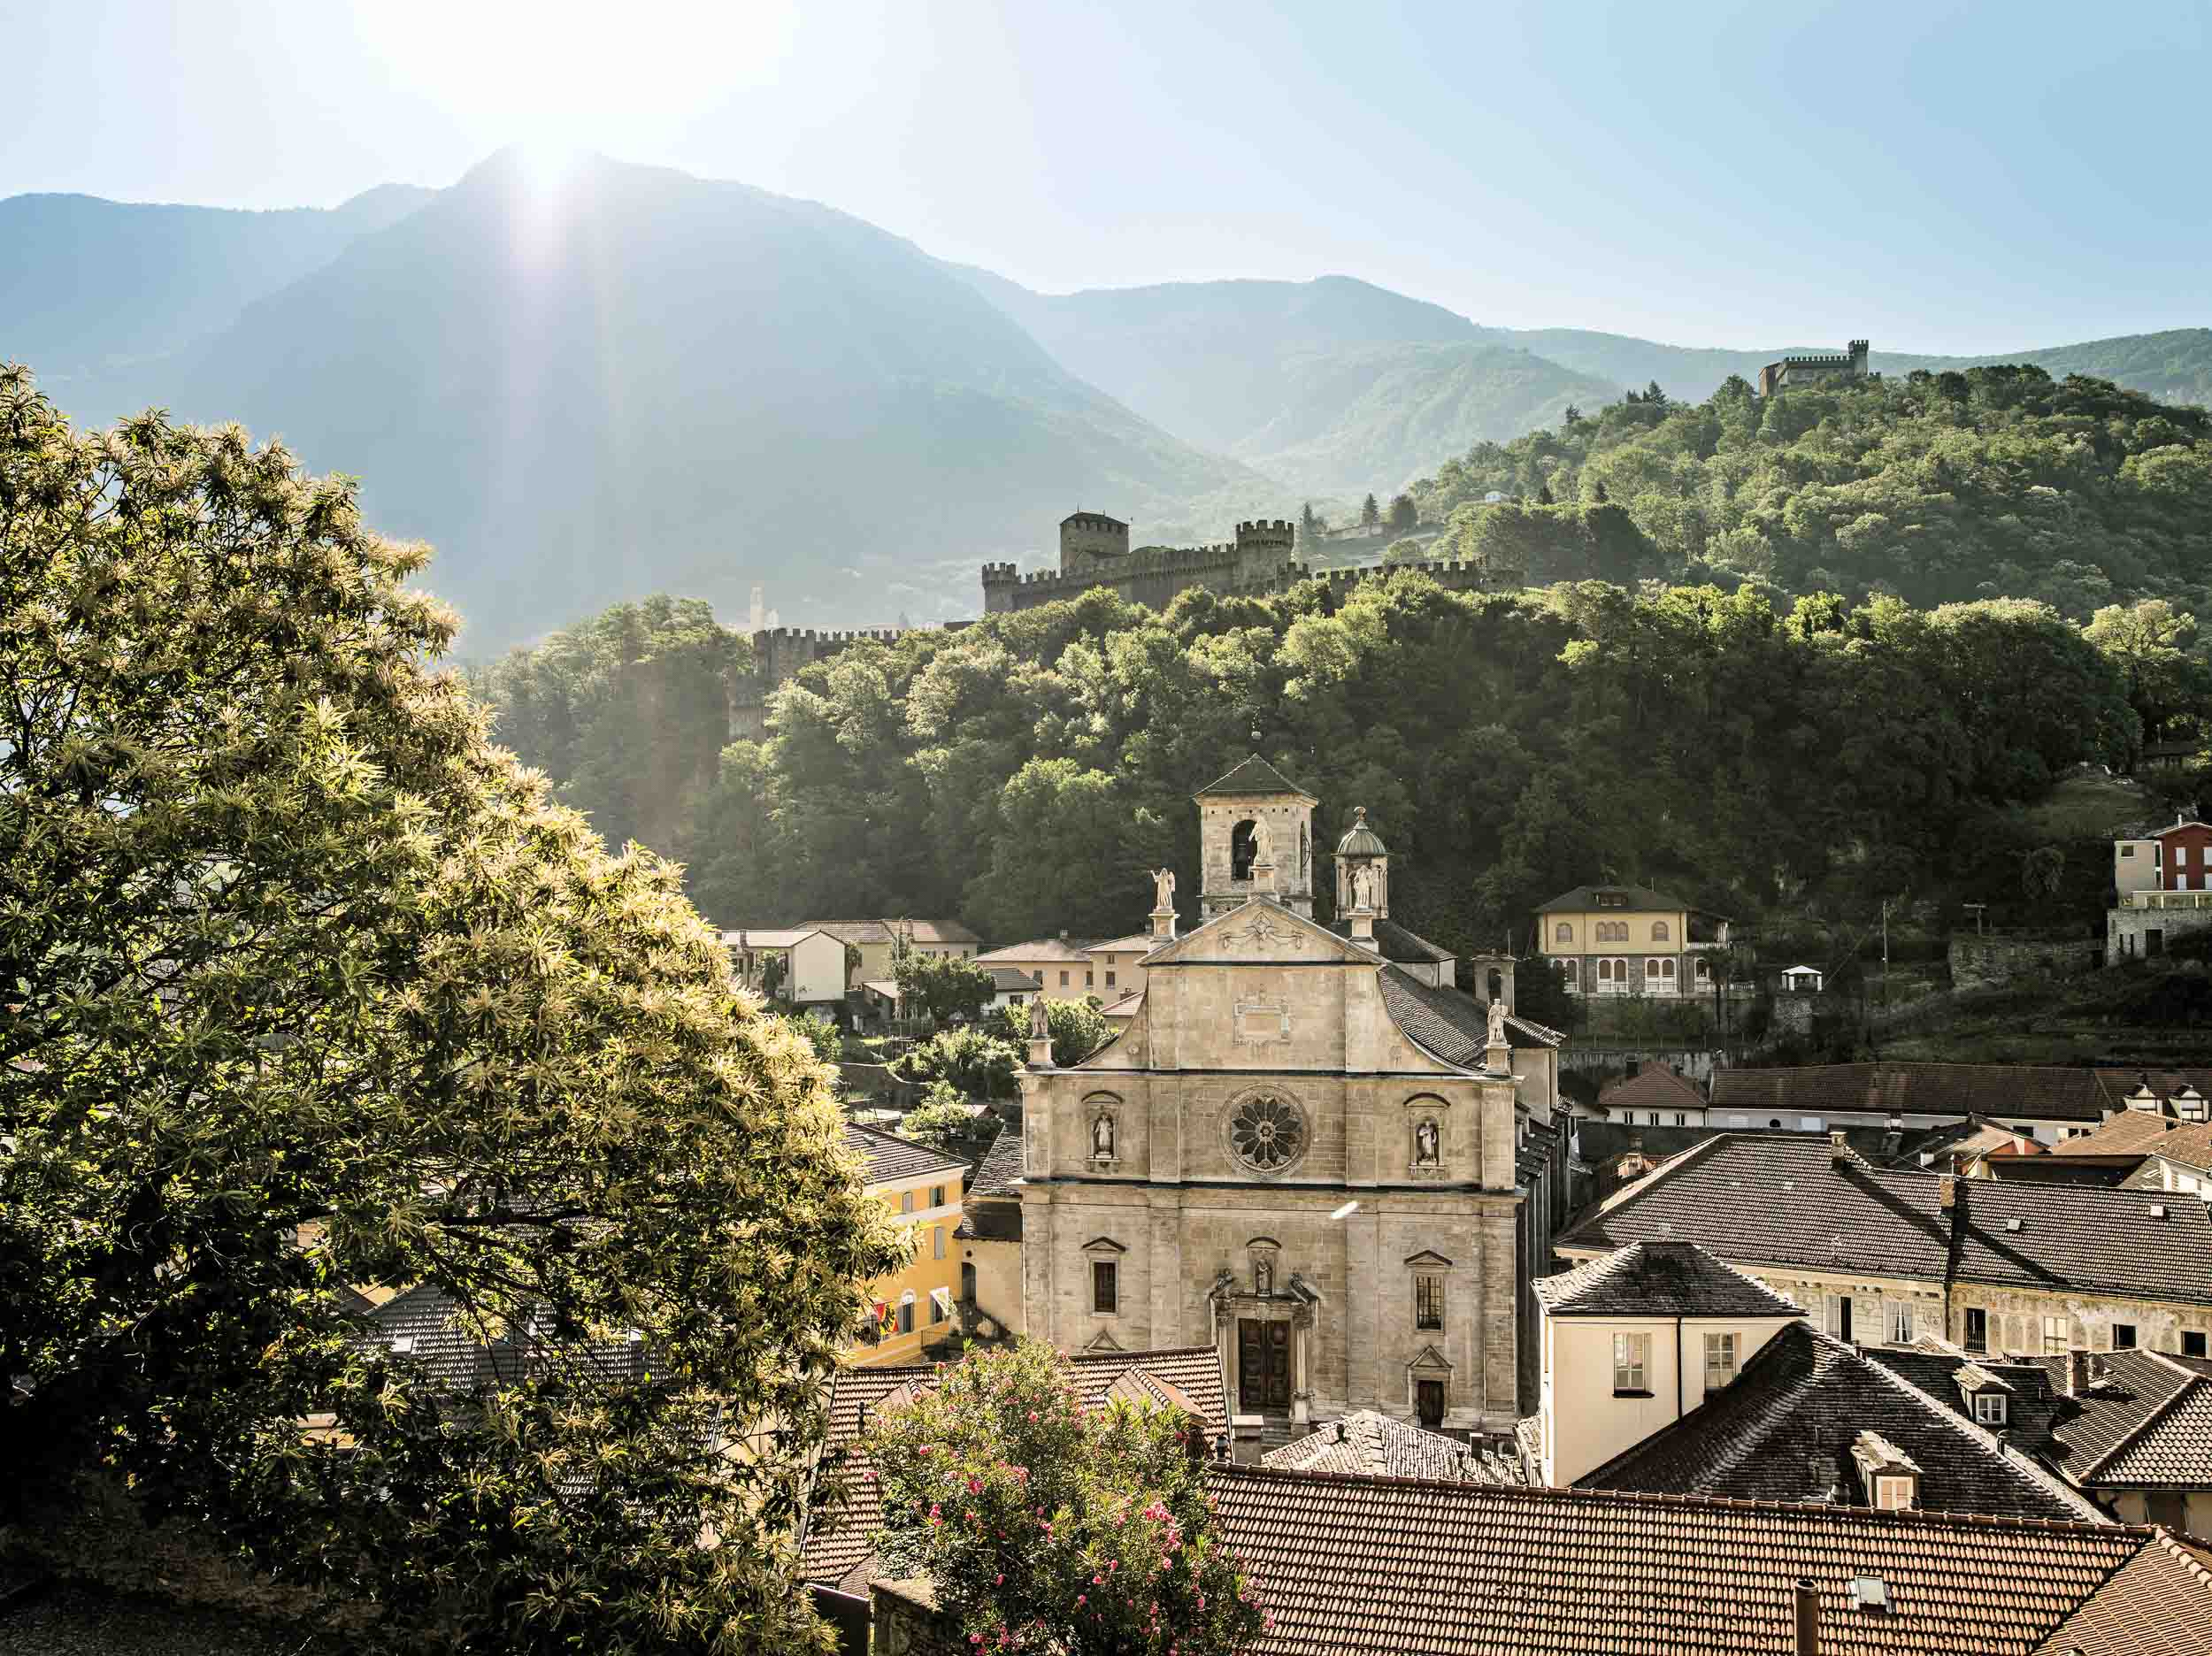 View of Collegiate Church of SS. Pietro and Stefano with castle Montebello and Sasso Corbaro in the background, Bellinzona.